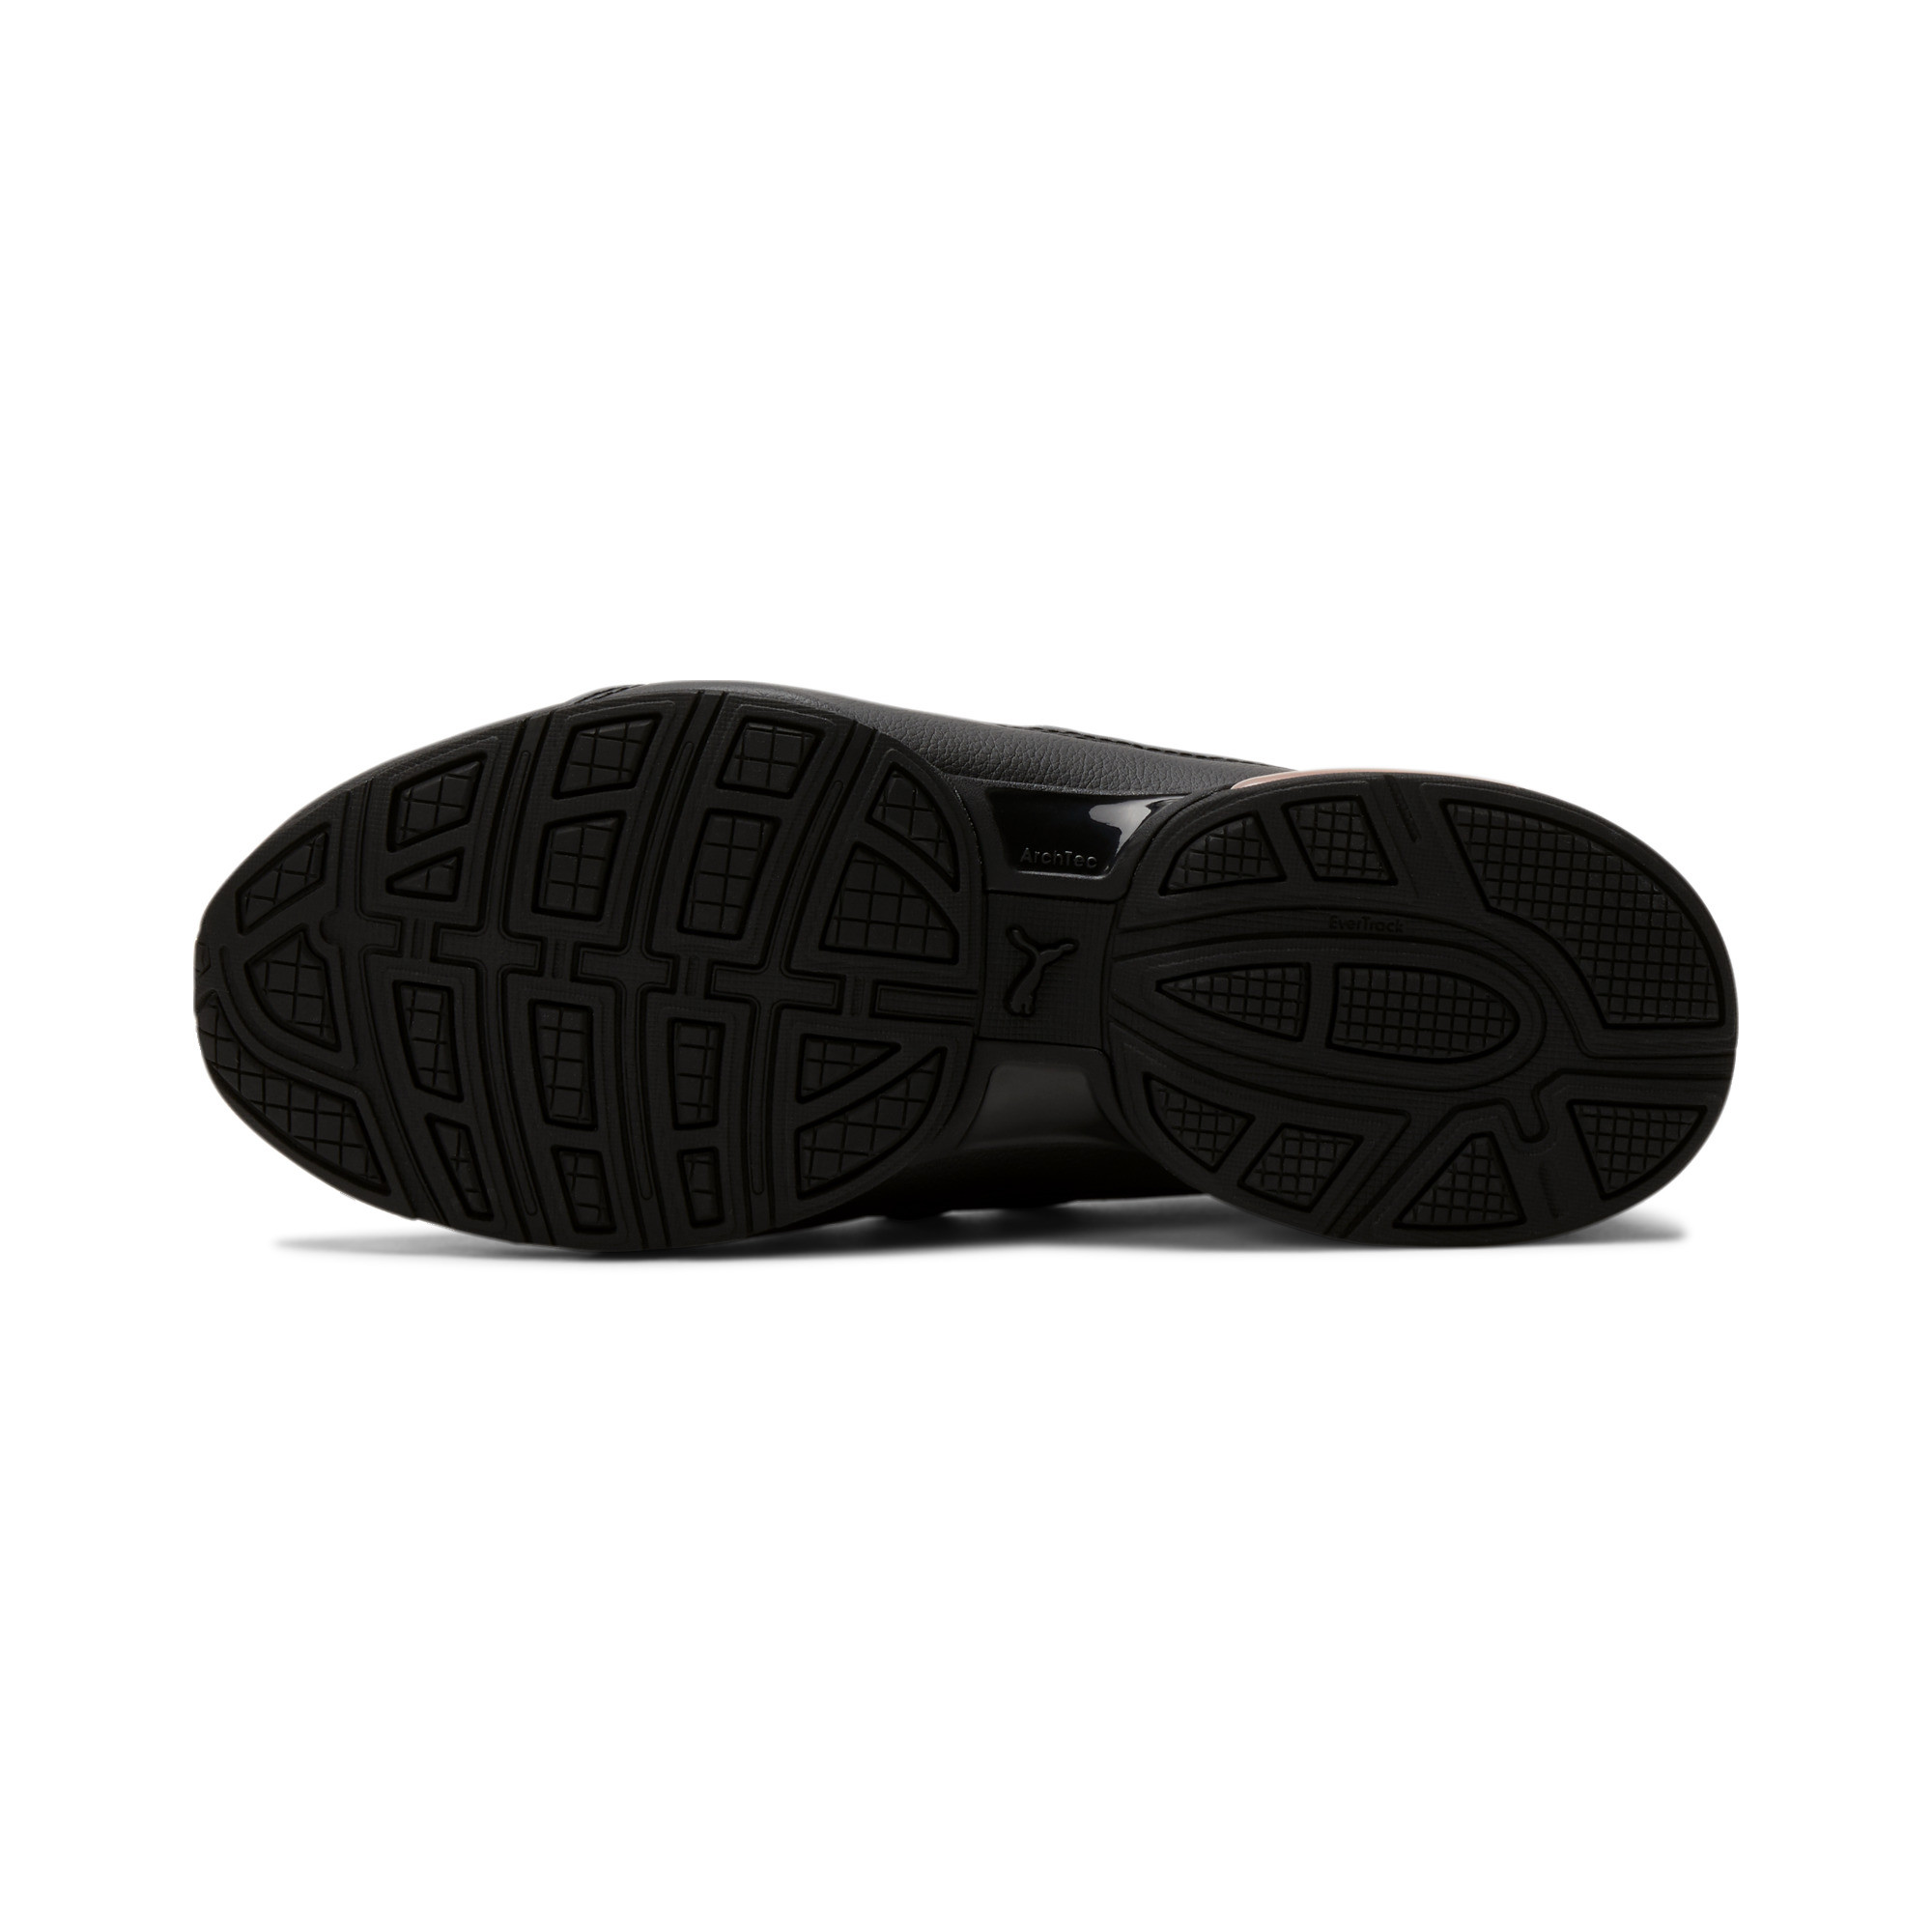 thumbnail 8 - PUMA Women's Riaze Prowl Mandala Training Shoes